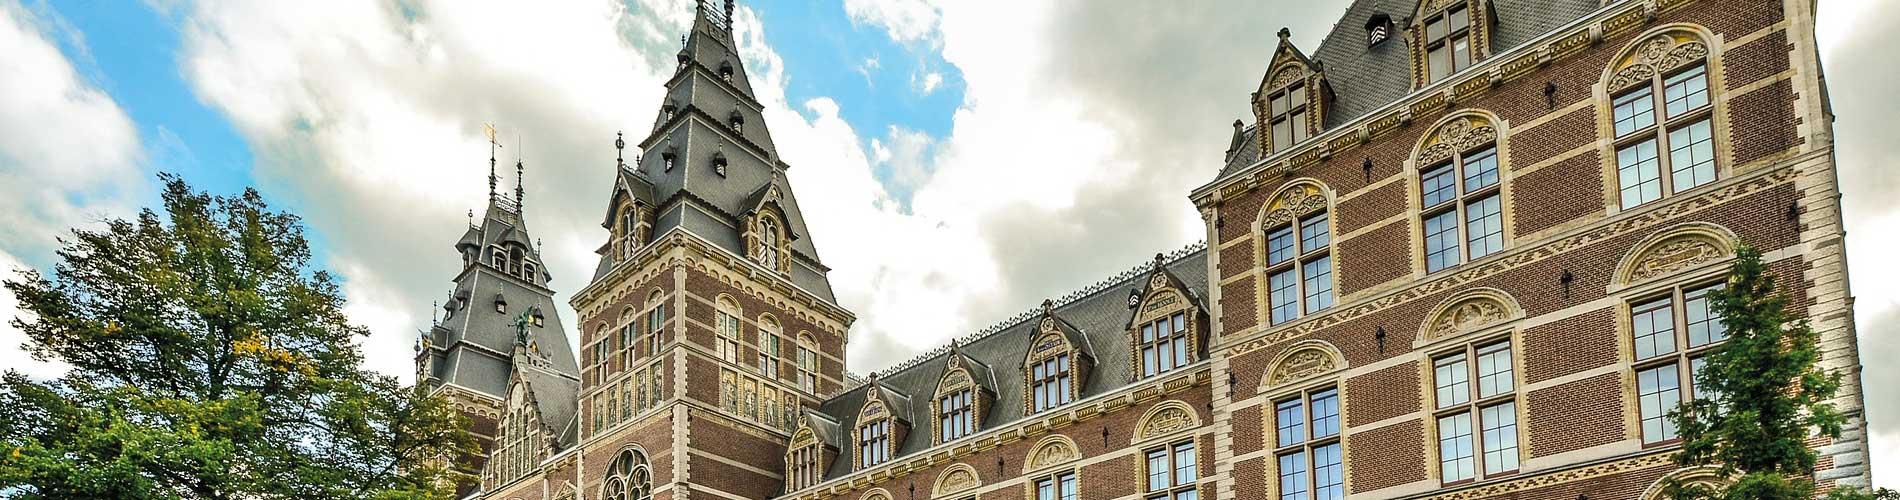 Blog_BestMuseumsAmsterdam_Rijksmuseum_1900x500_Q120